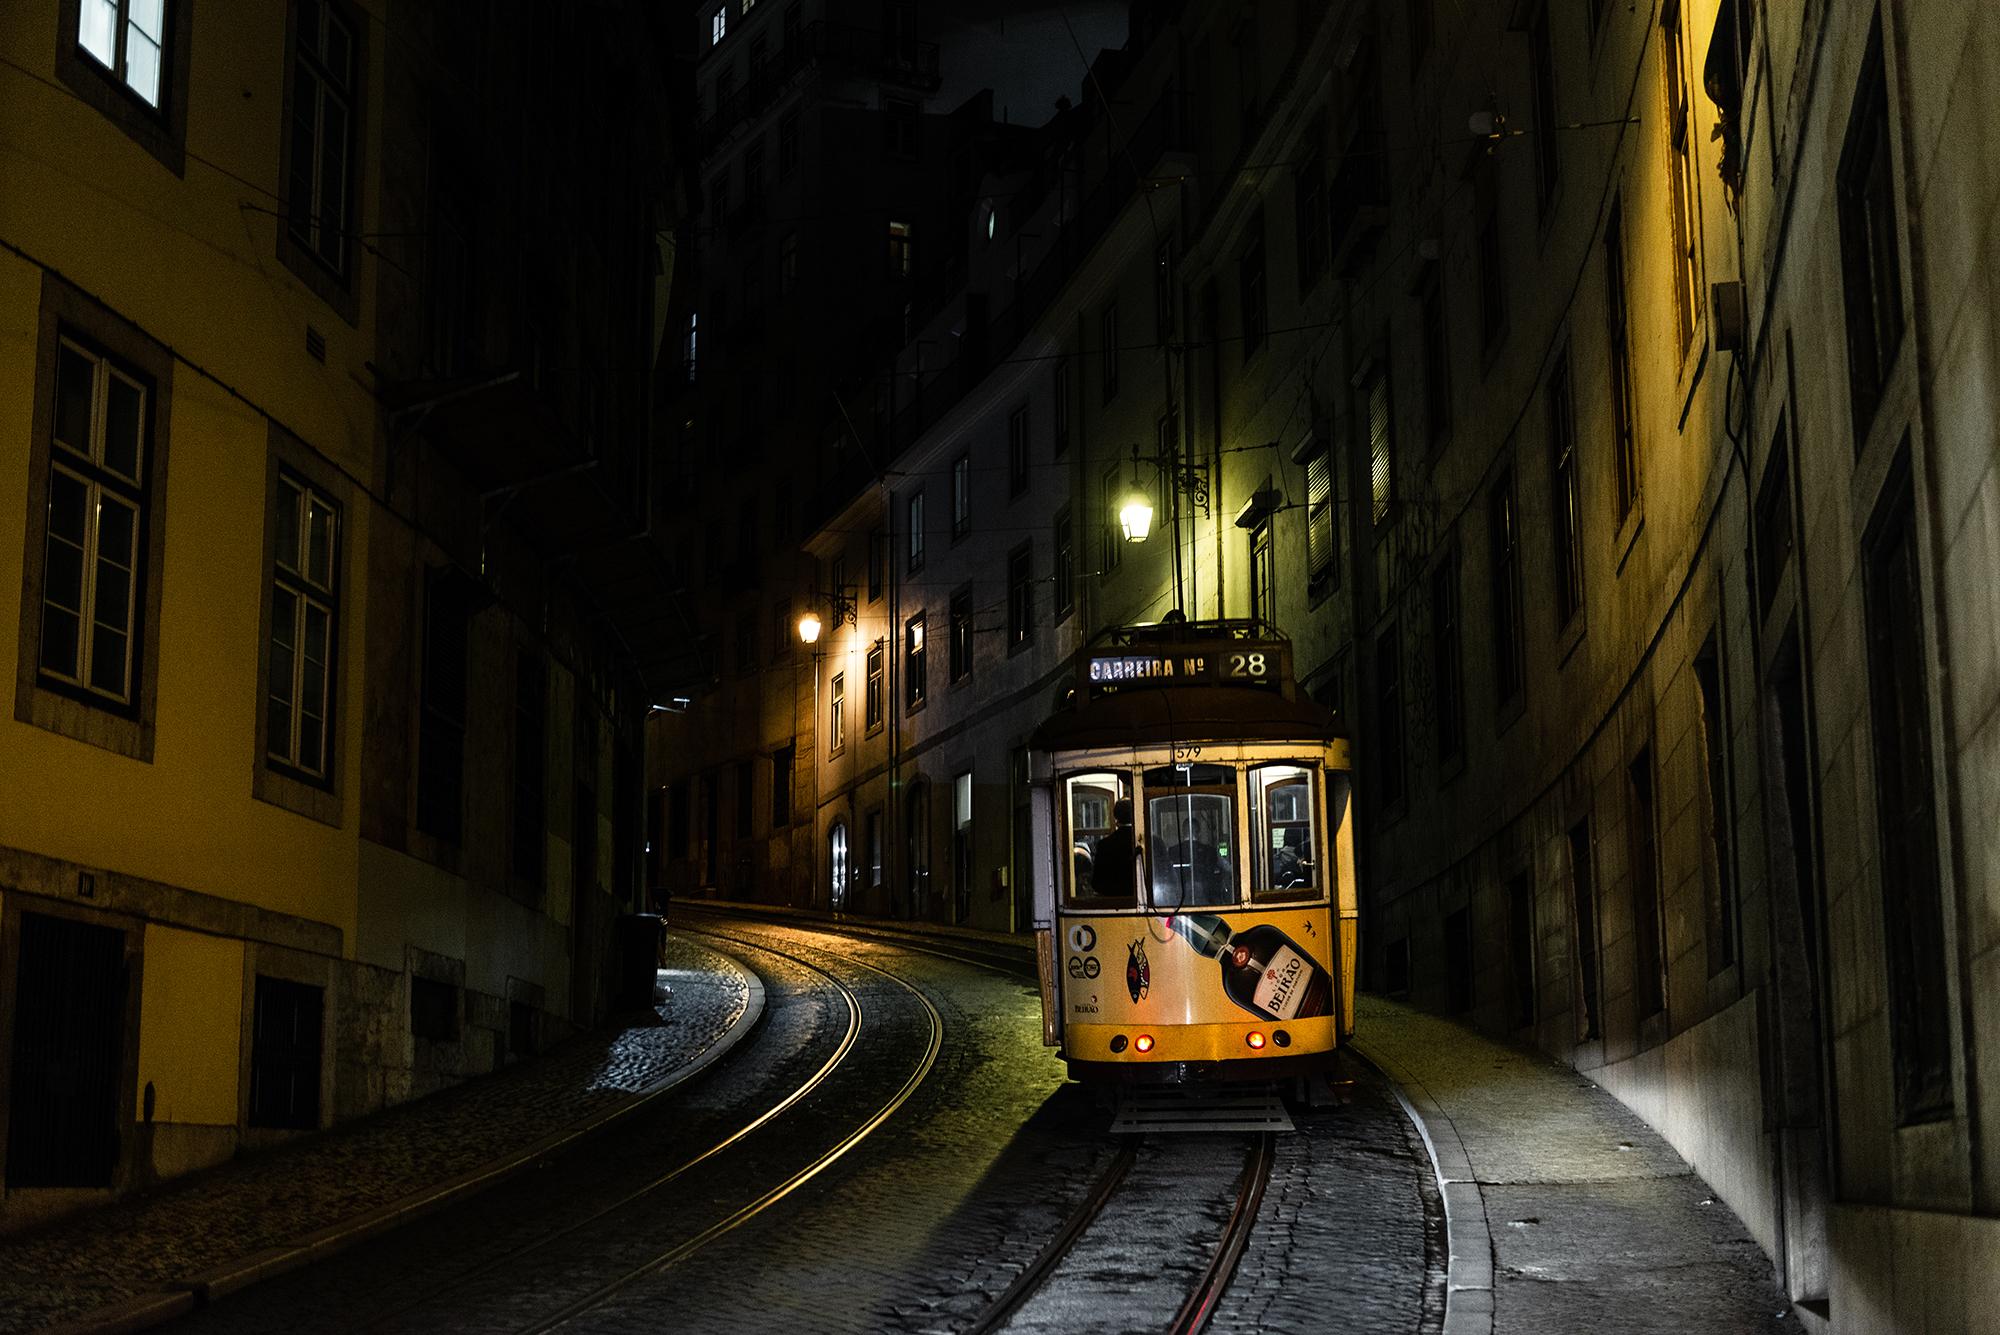 Yellow tram in Lisbon at night